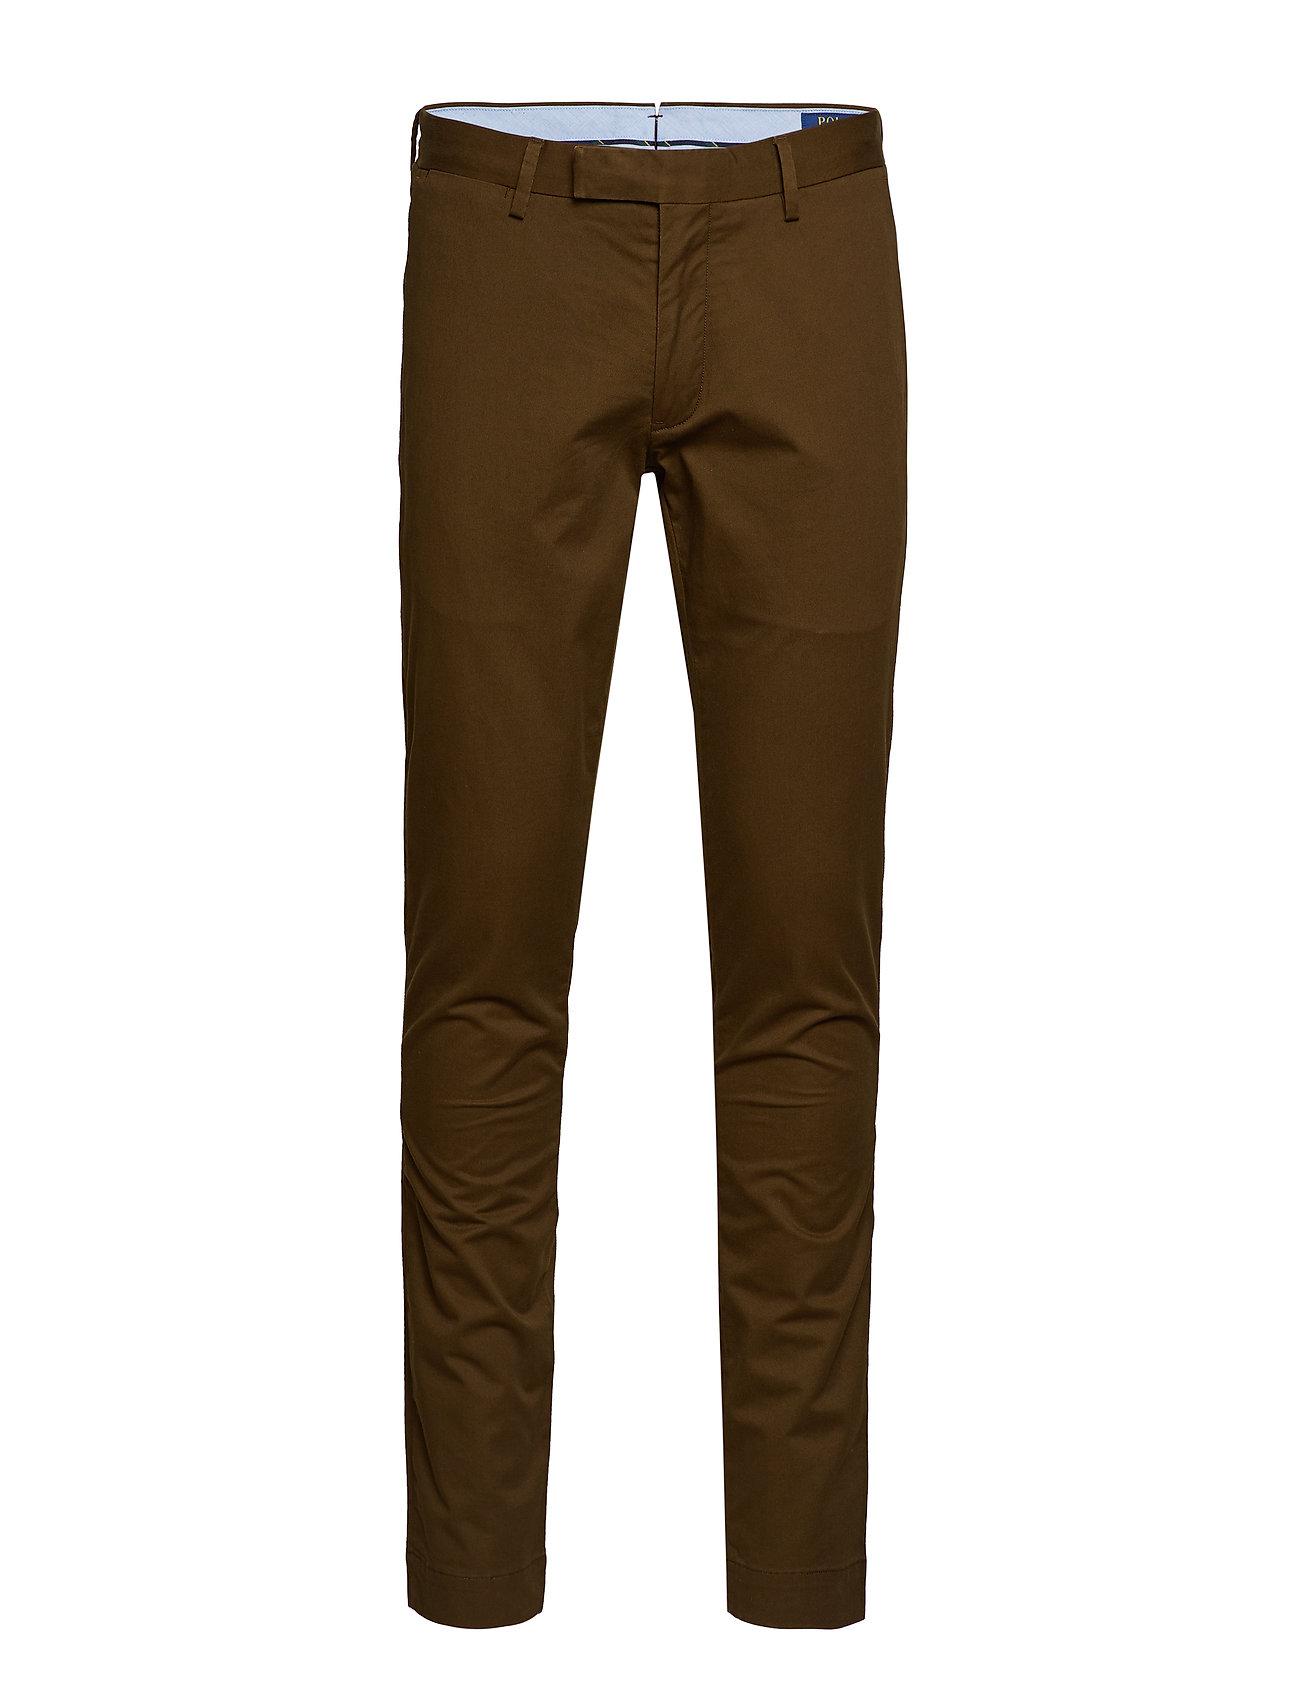 Polo Ralph Lauren TSLFHDNP-FLAT-PANT - HOLIDAY BROWN